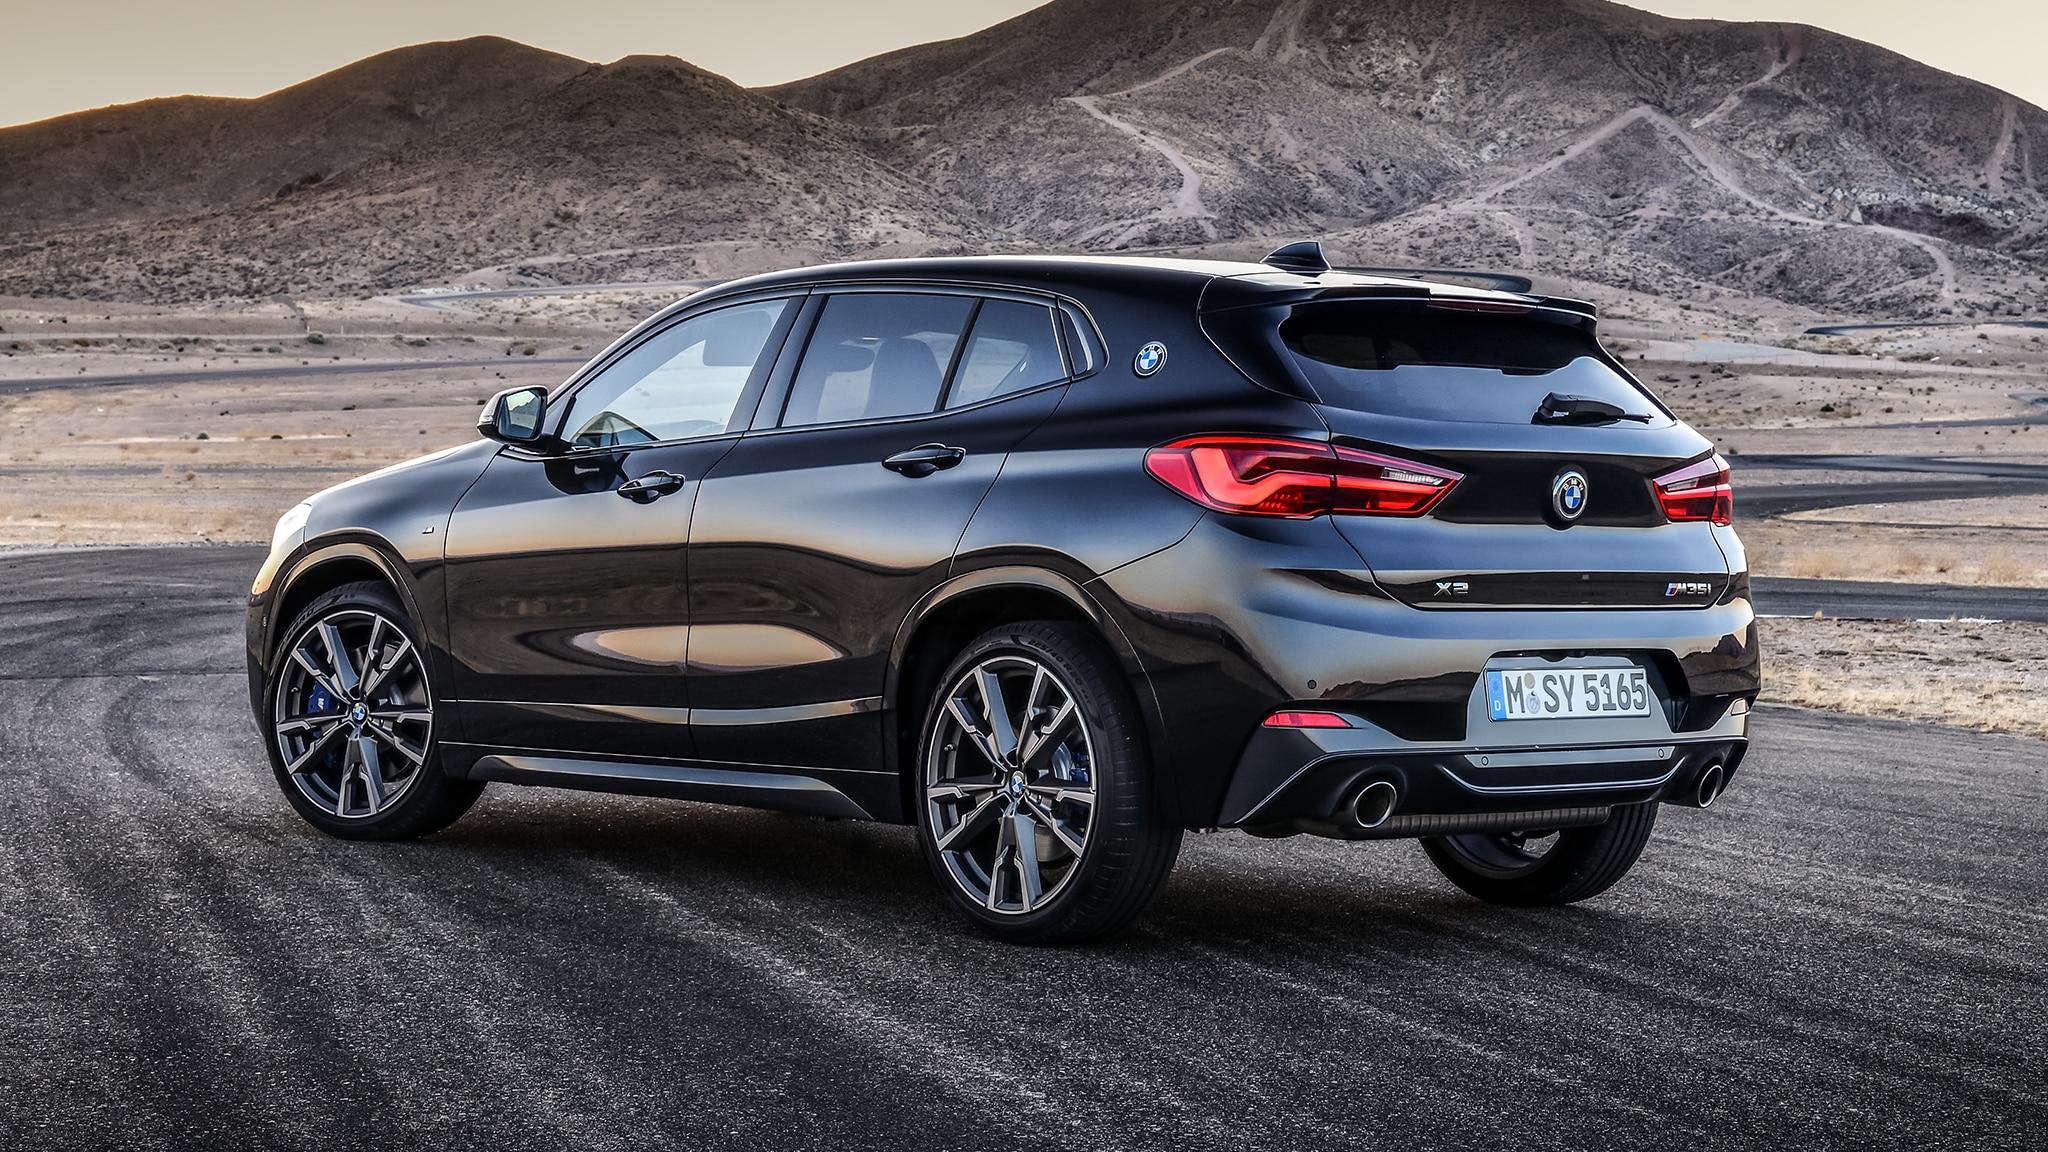 2019 bmw x2 m35i revealed with 302 hp 2 0 liter turbo. Black Bedroom Furniture Sets. Home Design Ideas